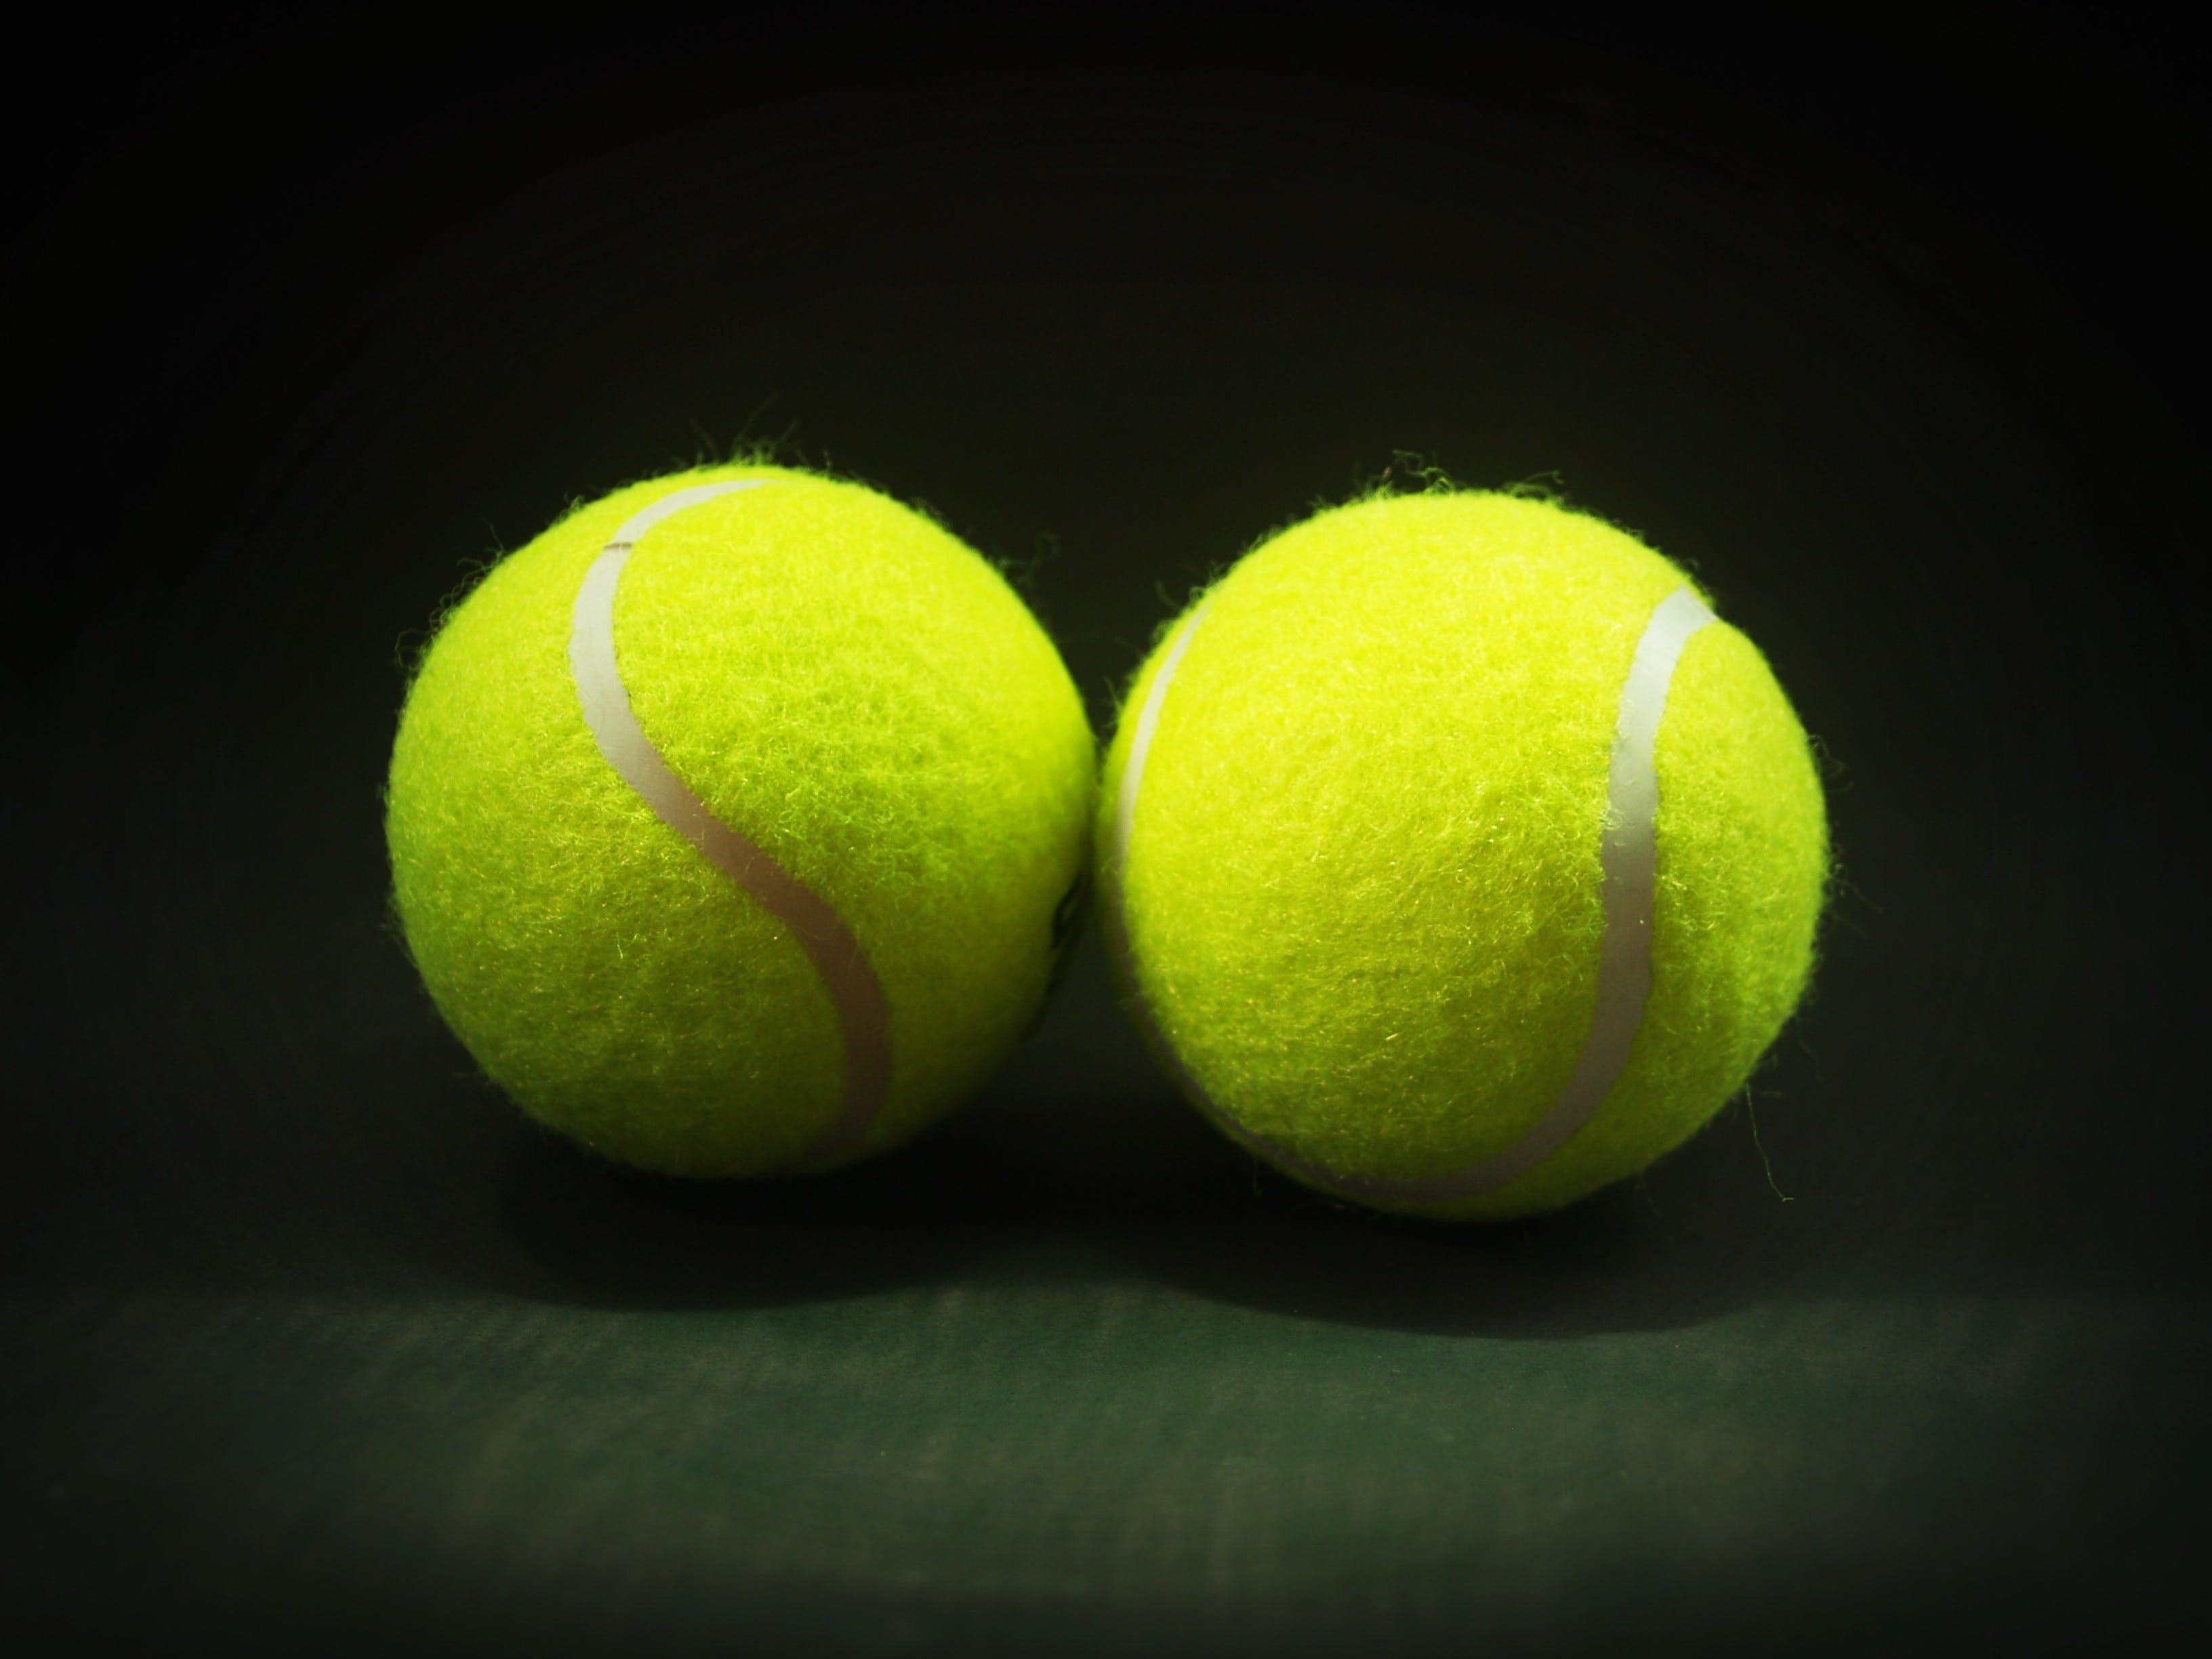 Two Tennis Balls